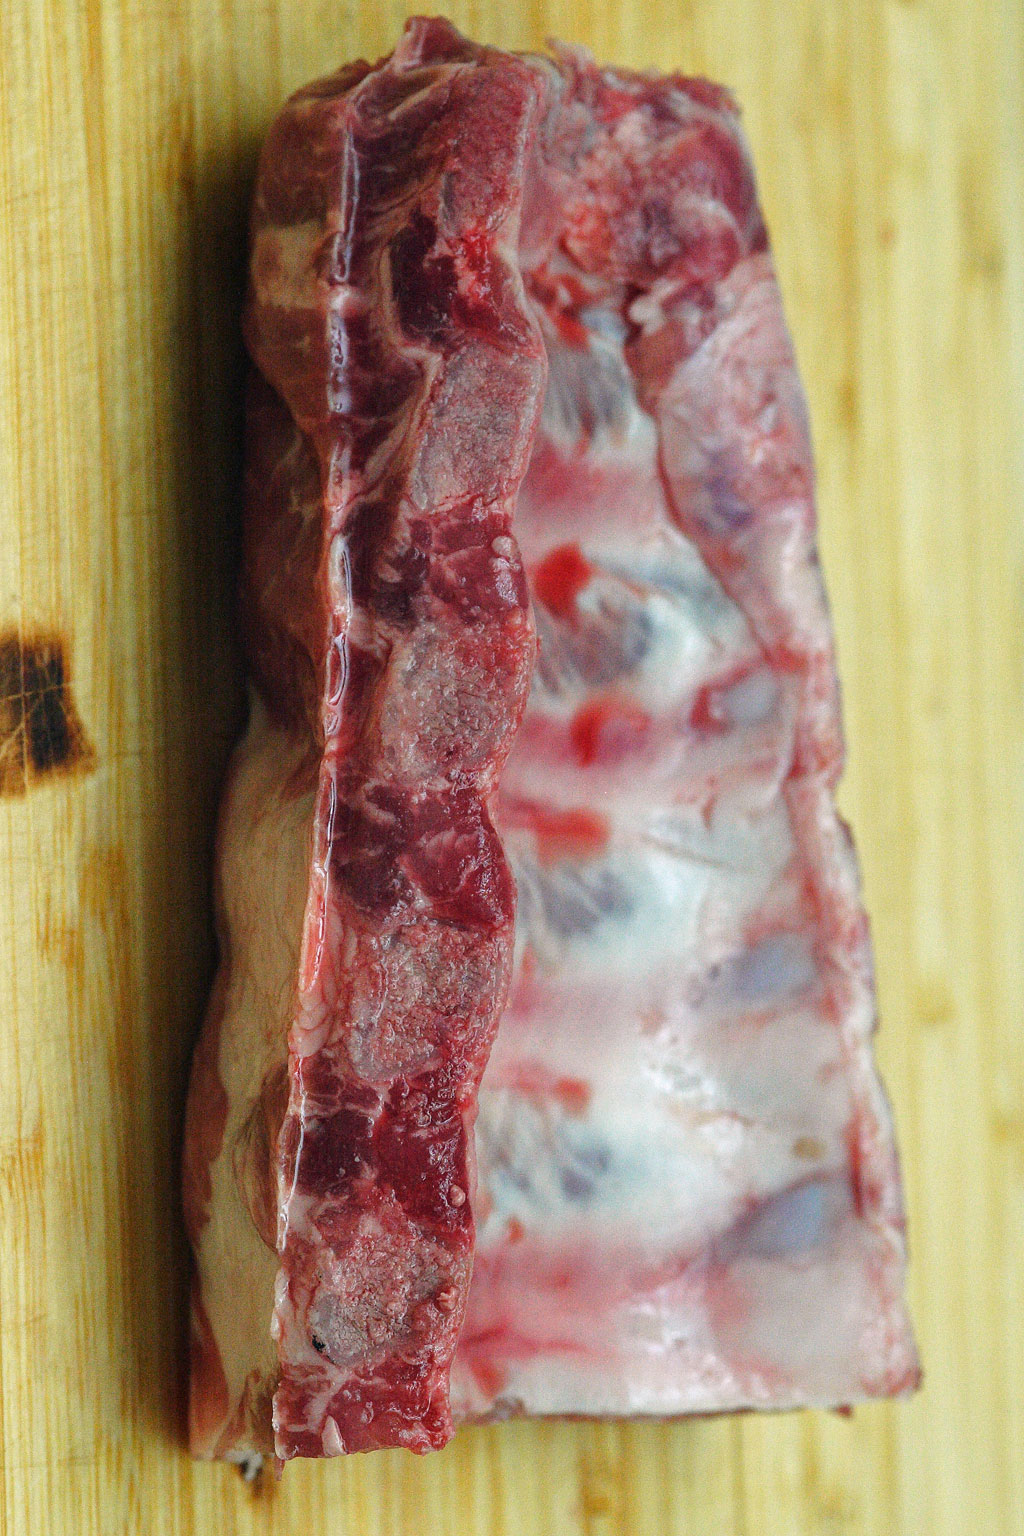 oven roasted pork ribs : sugar : salt : pepper : if only I could